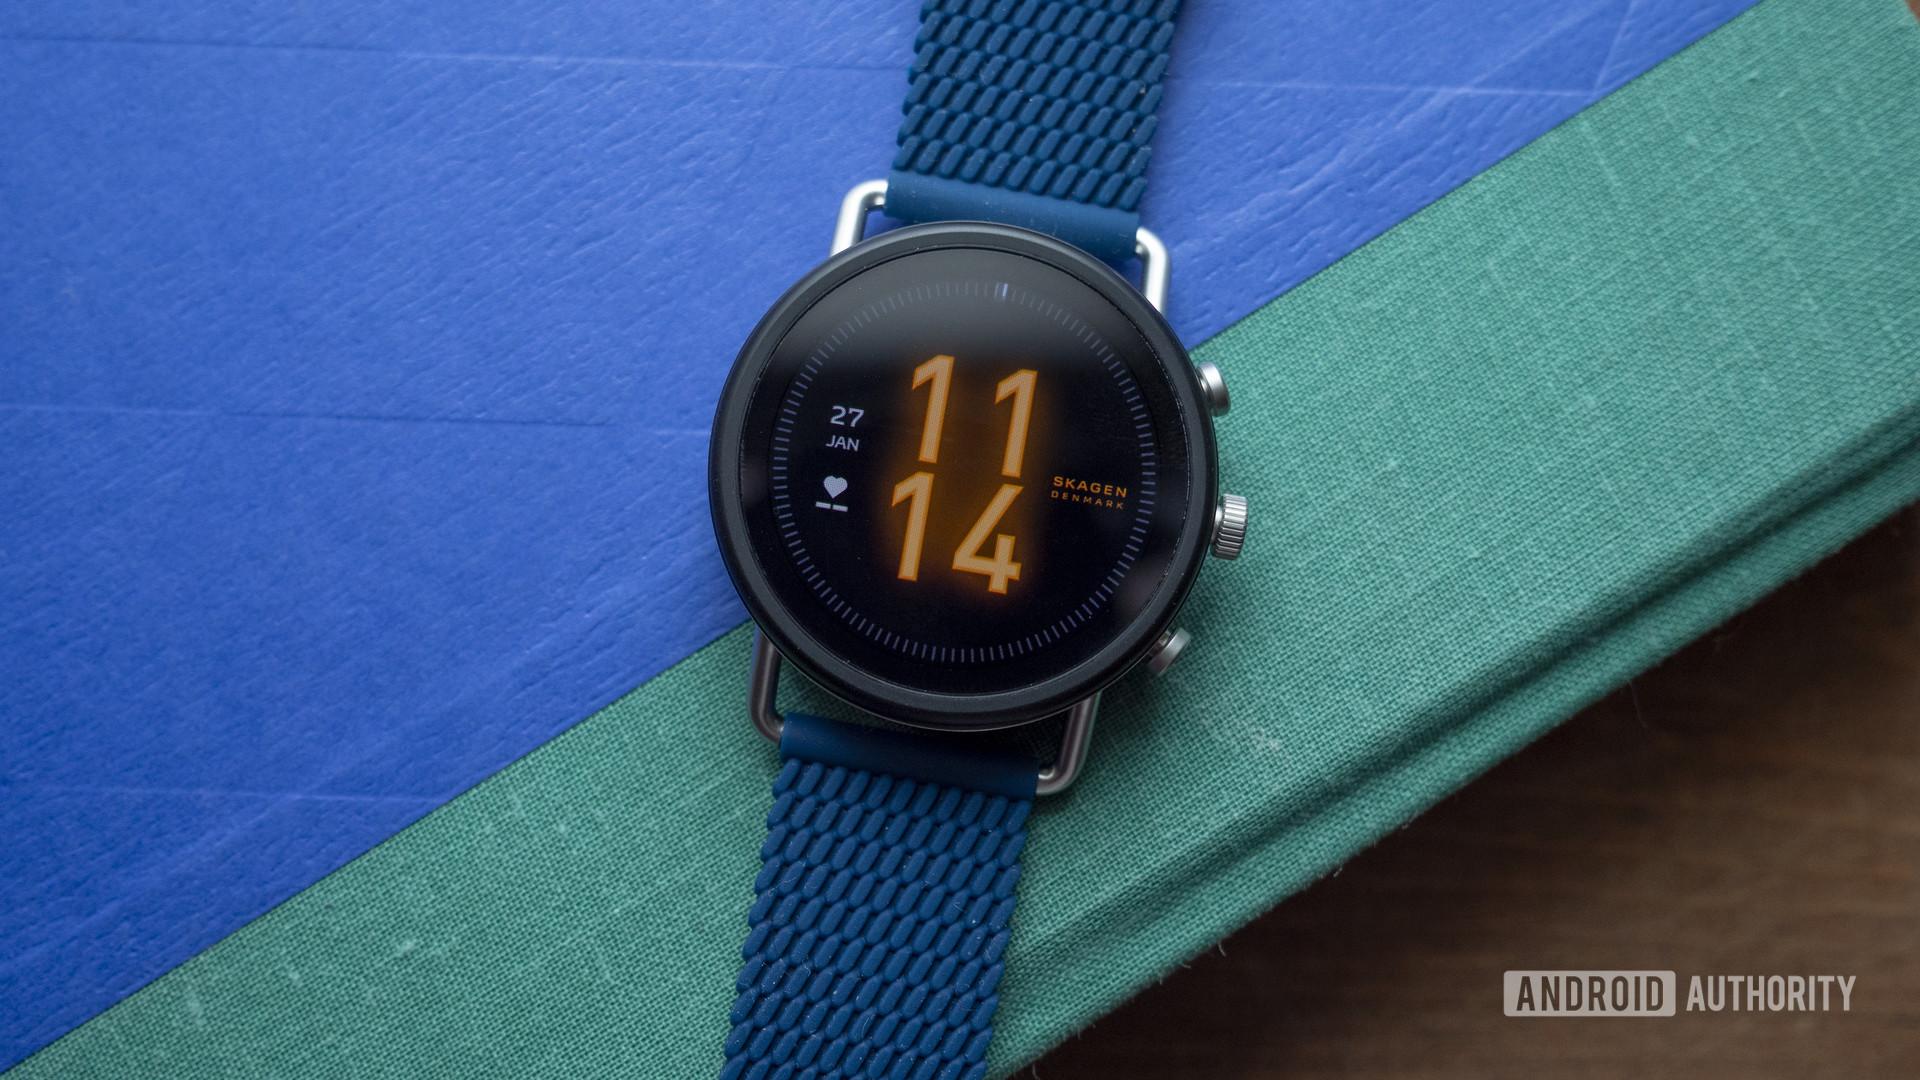 skagen falster 3 review watch face display 1